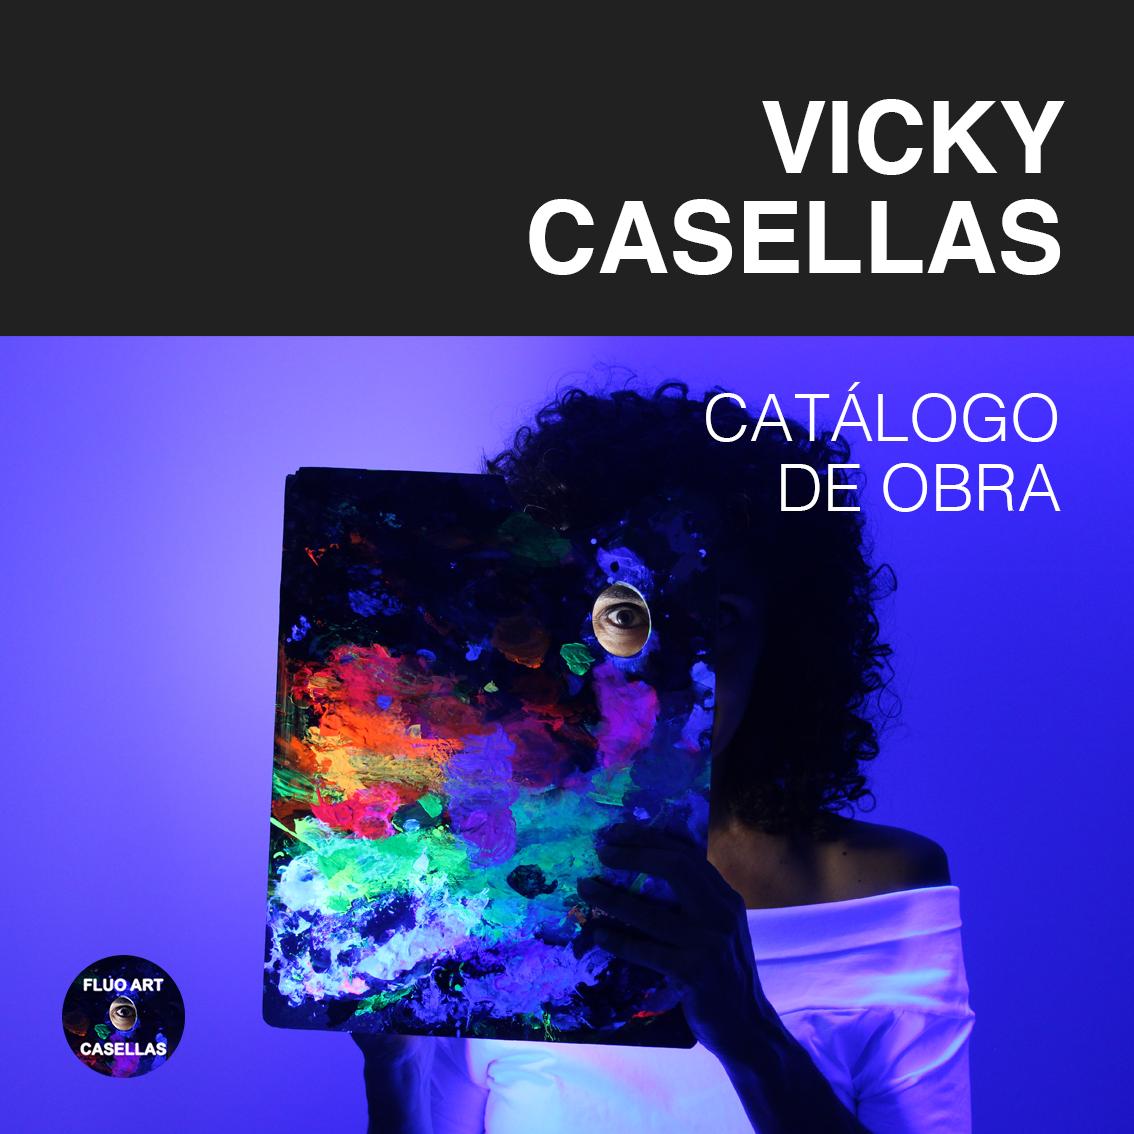 Vicky-Casellas.-Catálogo-de-obras-a-la-venta.-Arte-fluorescente.-Fluo-art